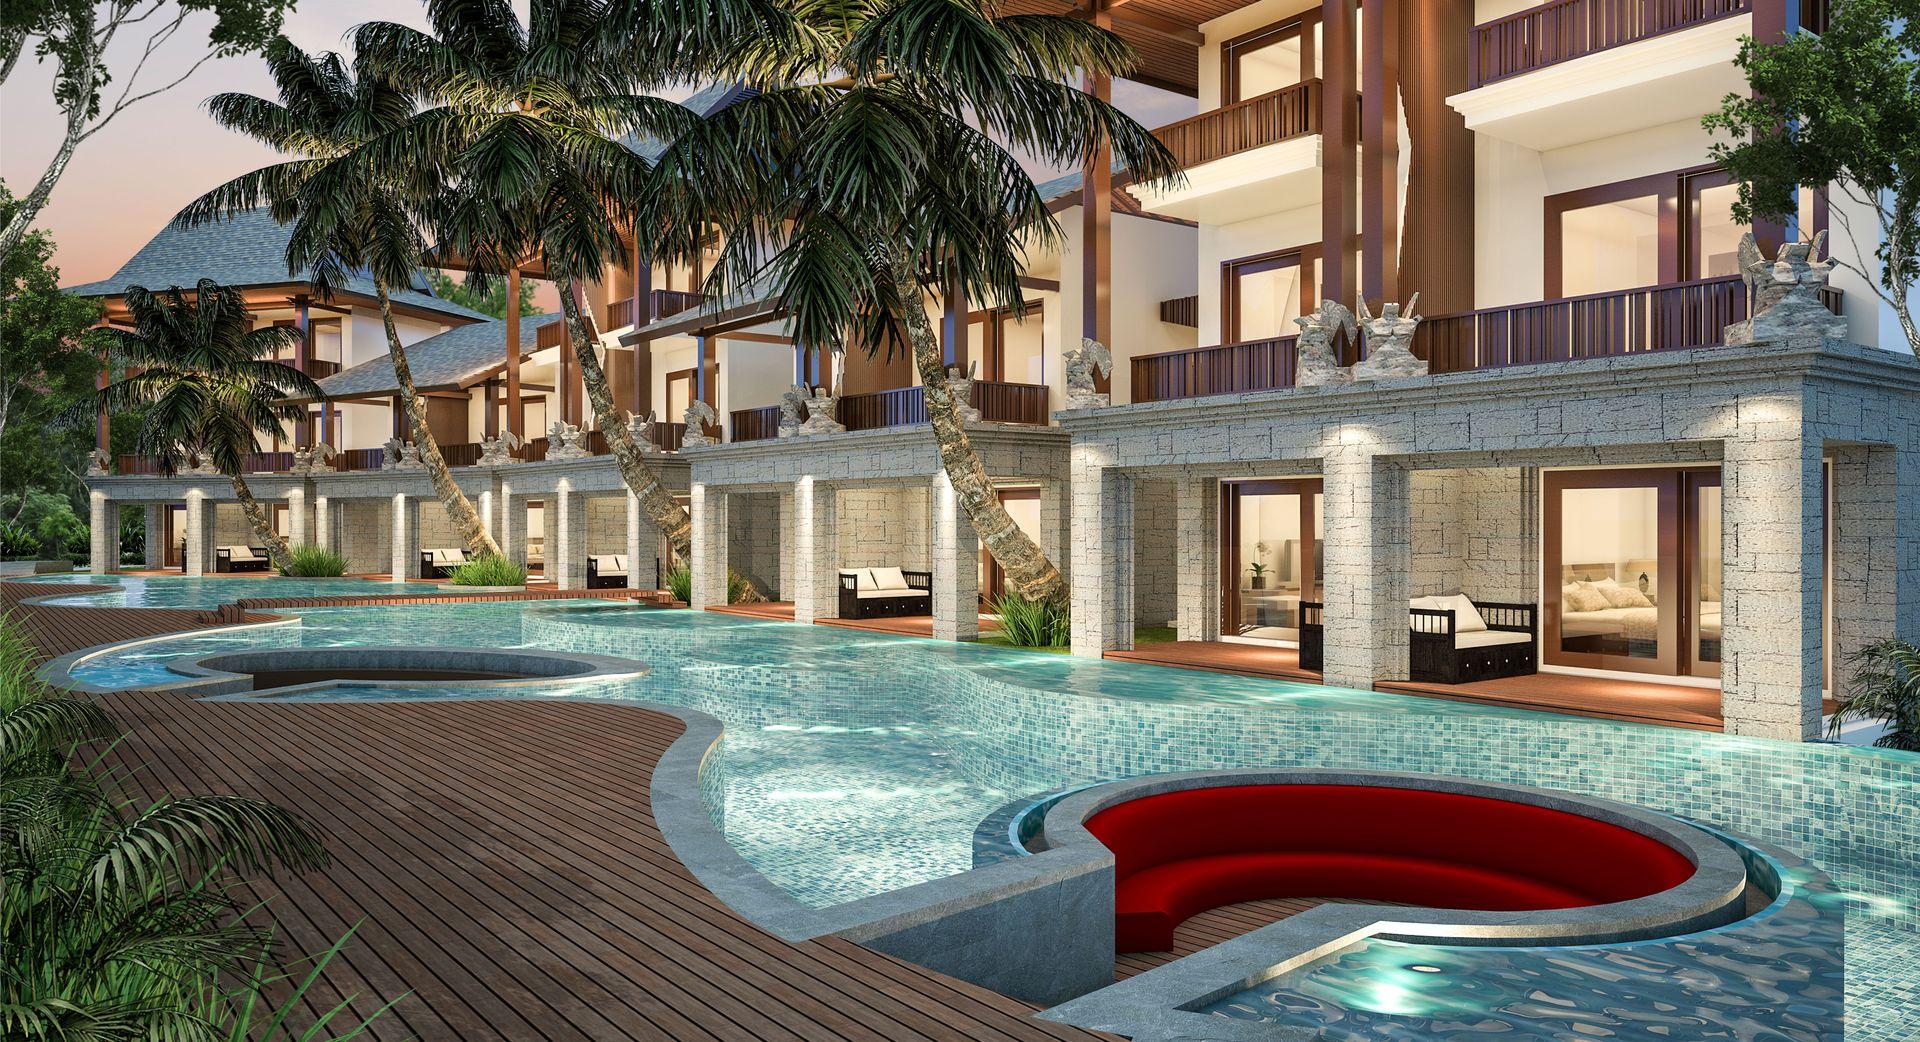 Canggu Beach Hotel 2018 World S Best